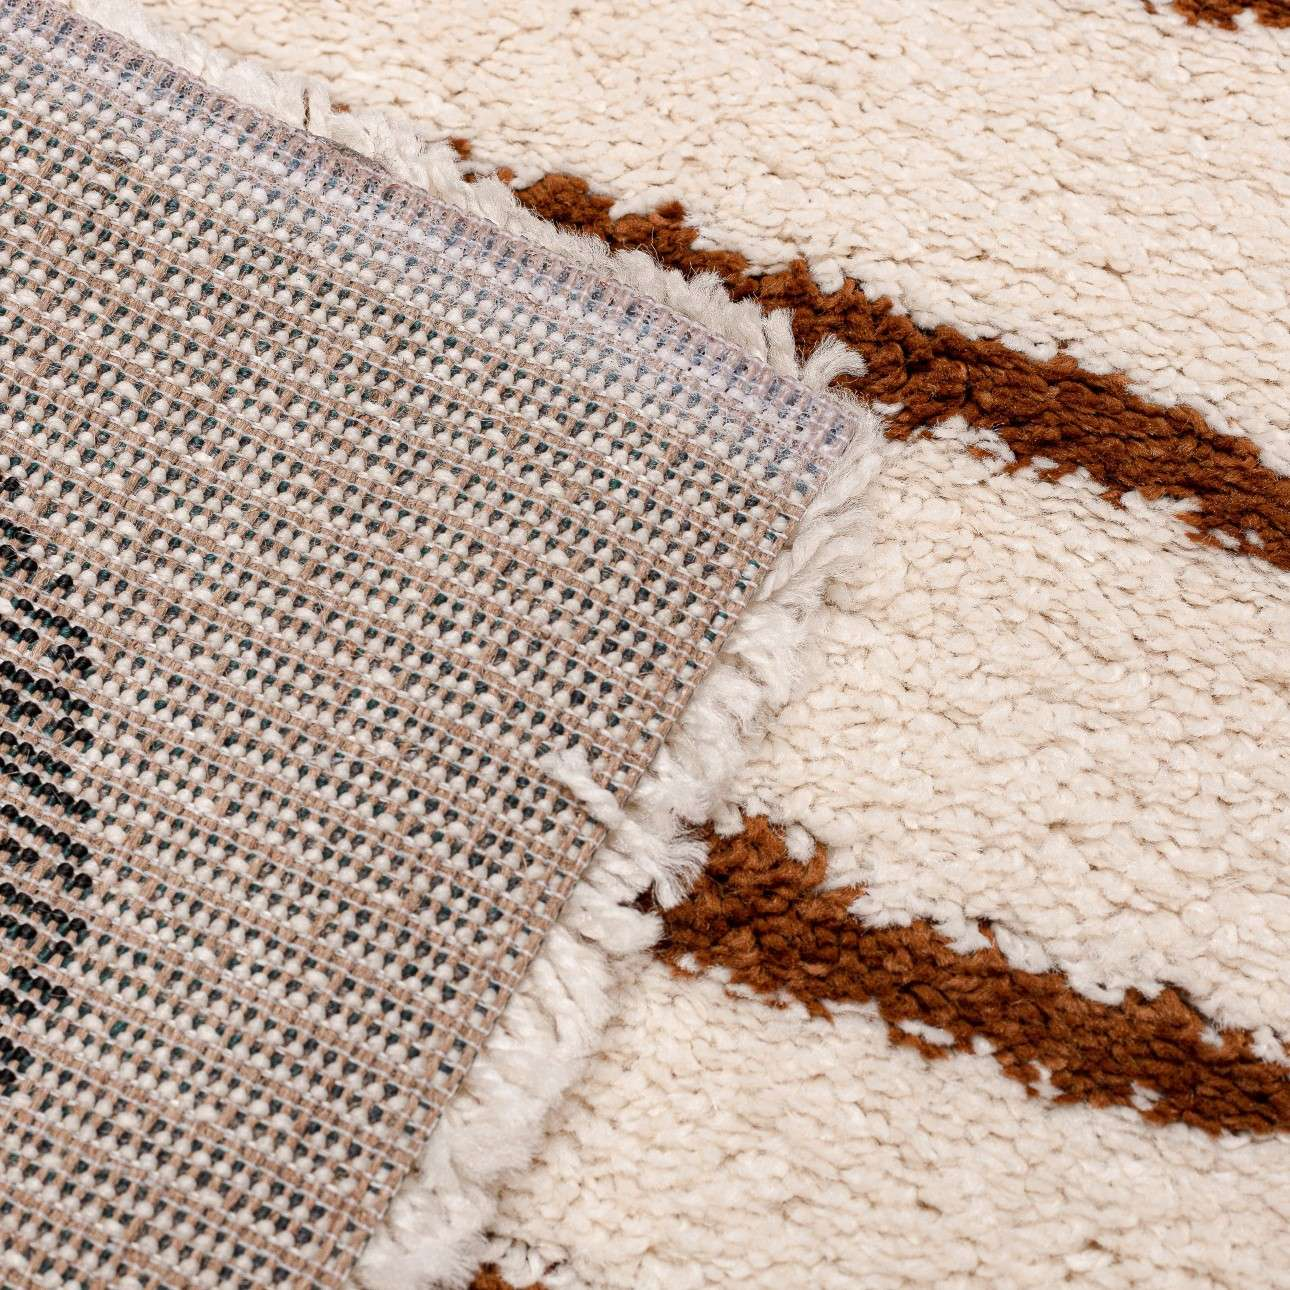 Tiger rug 160x230cm